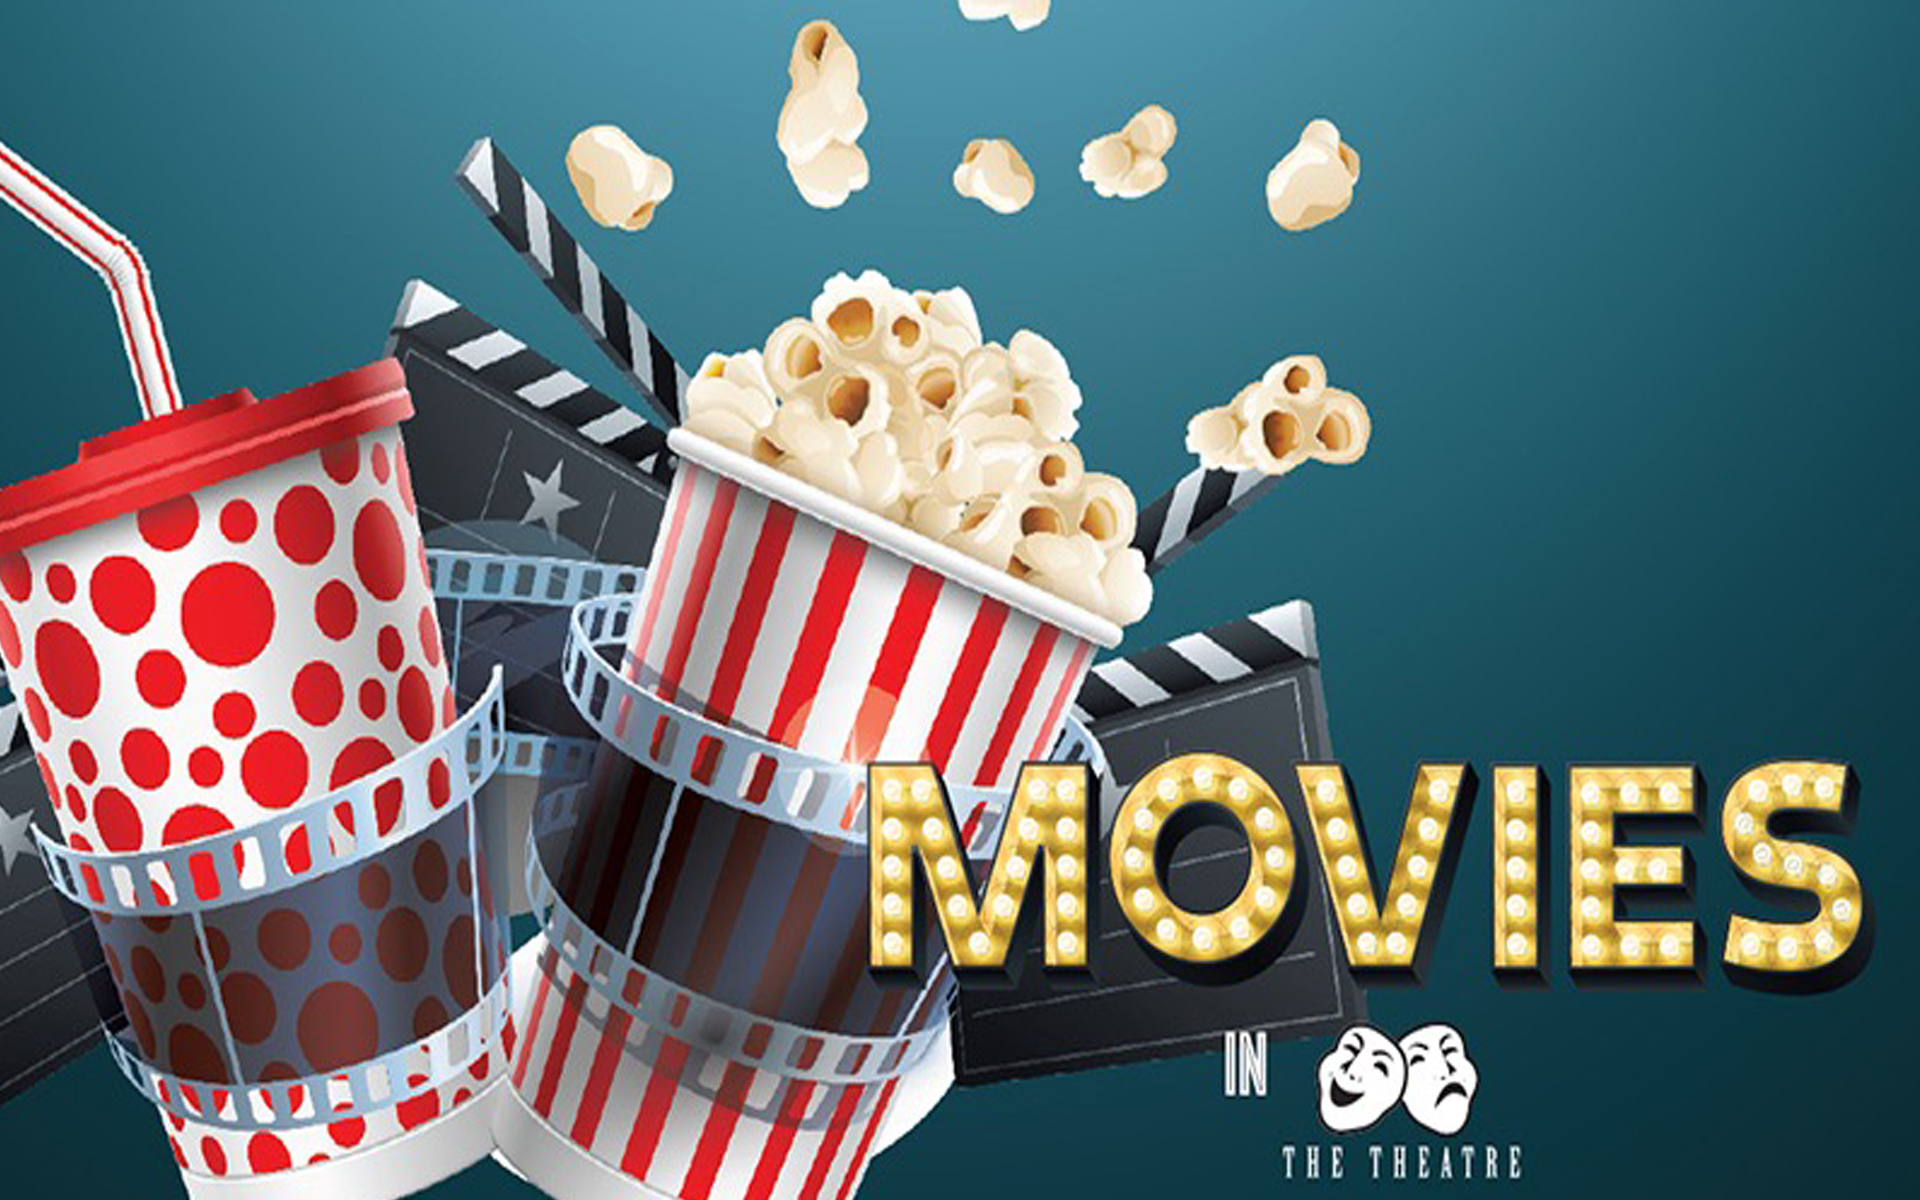 movies_movies_mobile_wallpaper.jpg